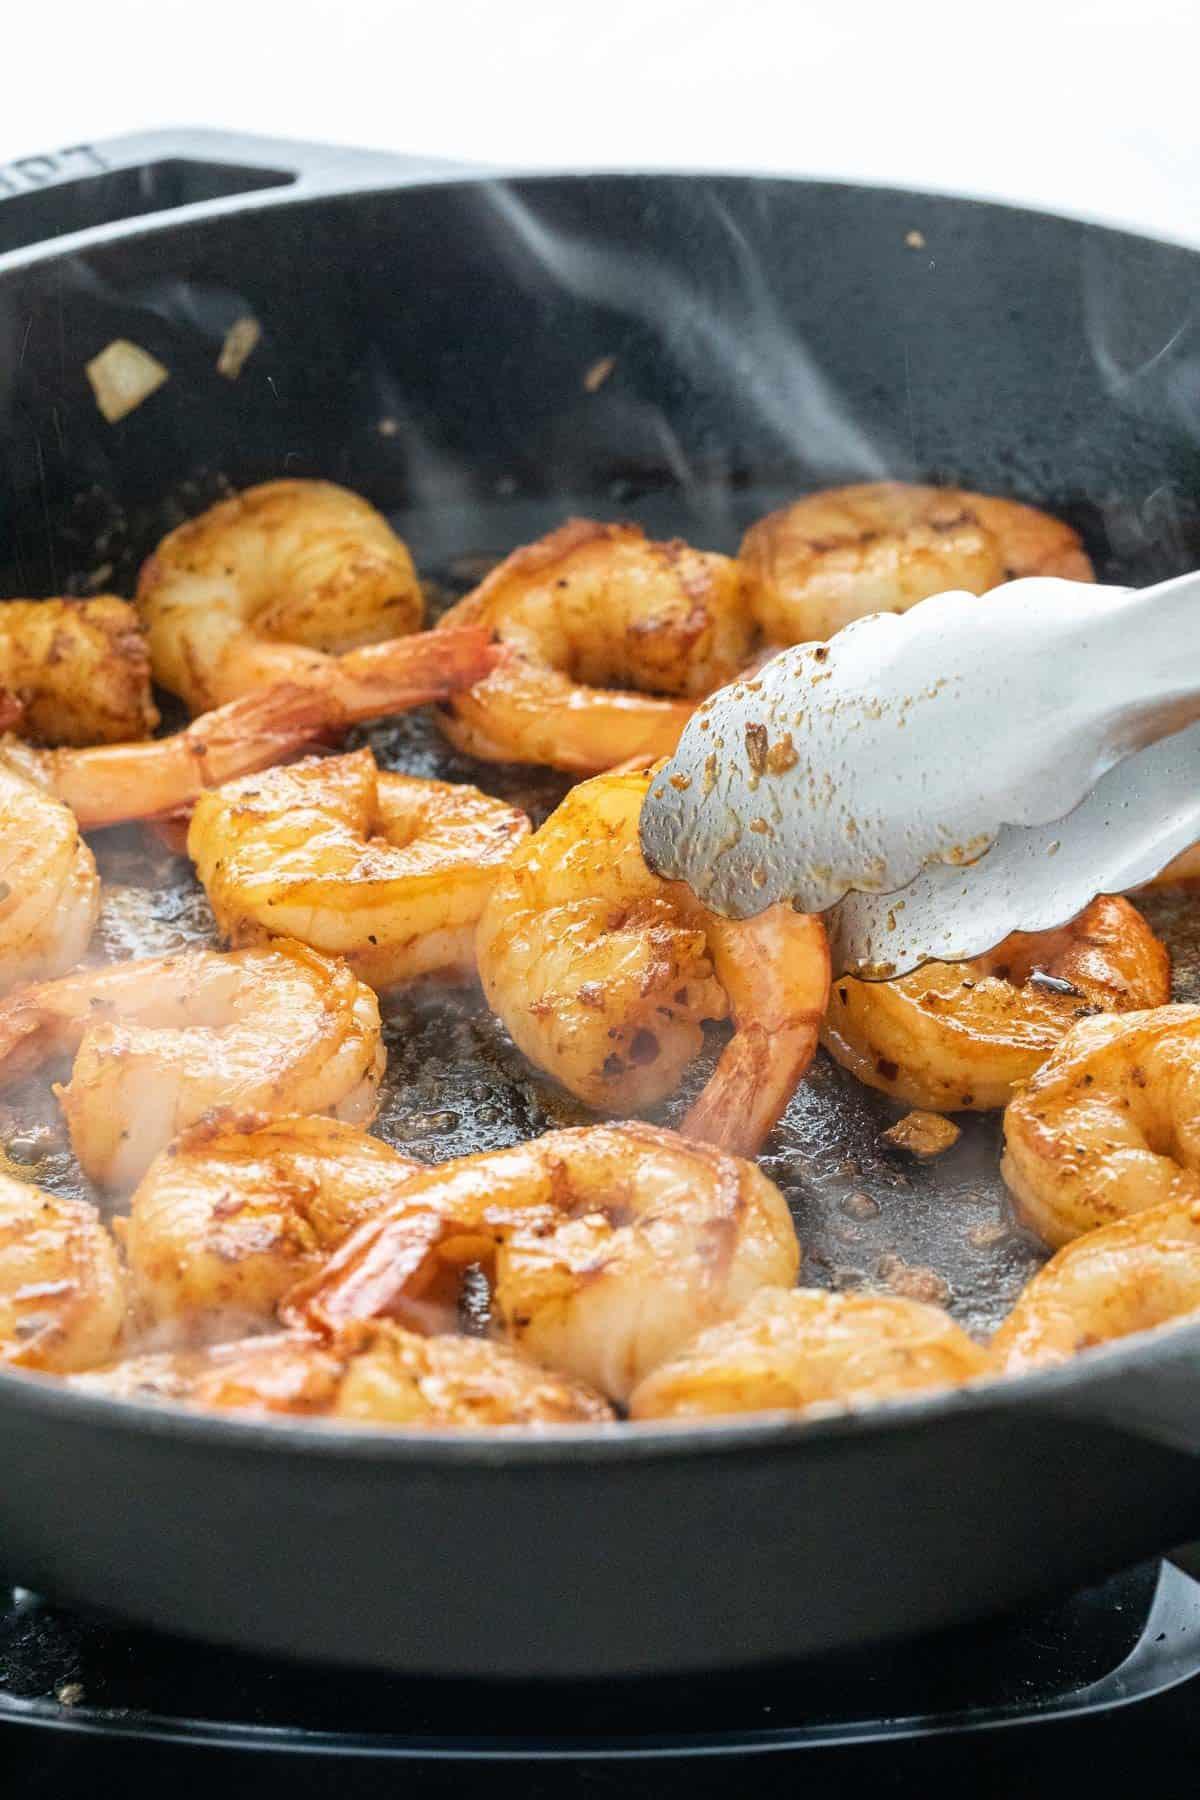 seared pieces of shrimp